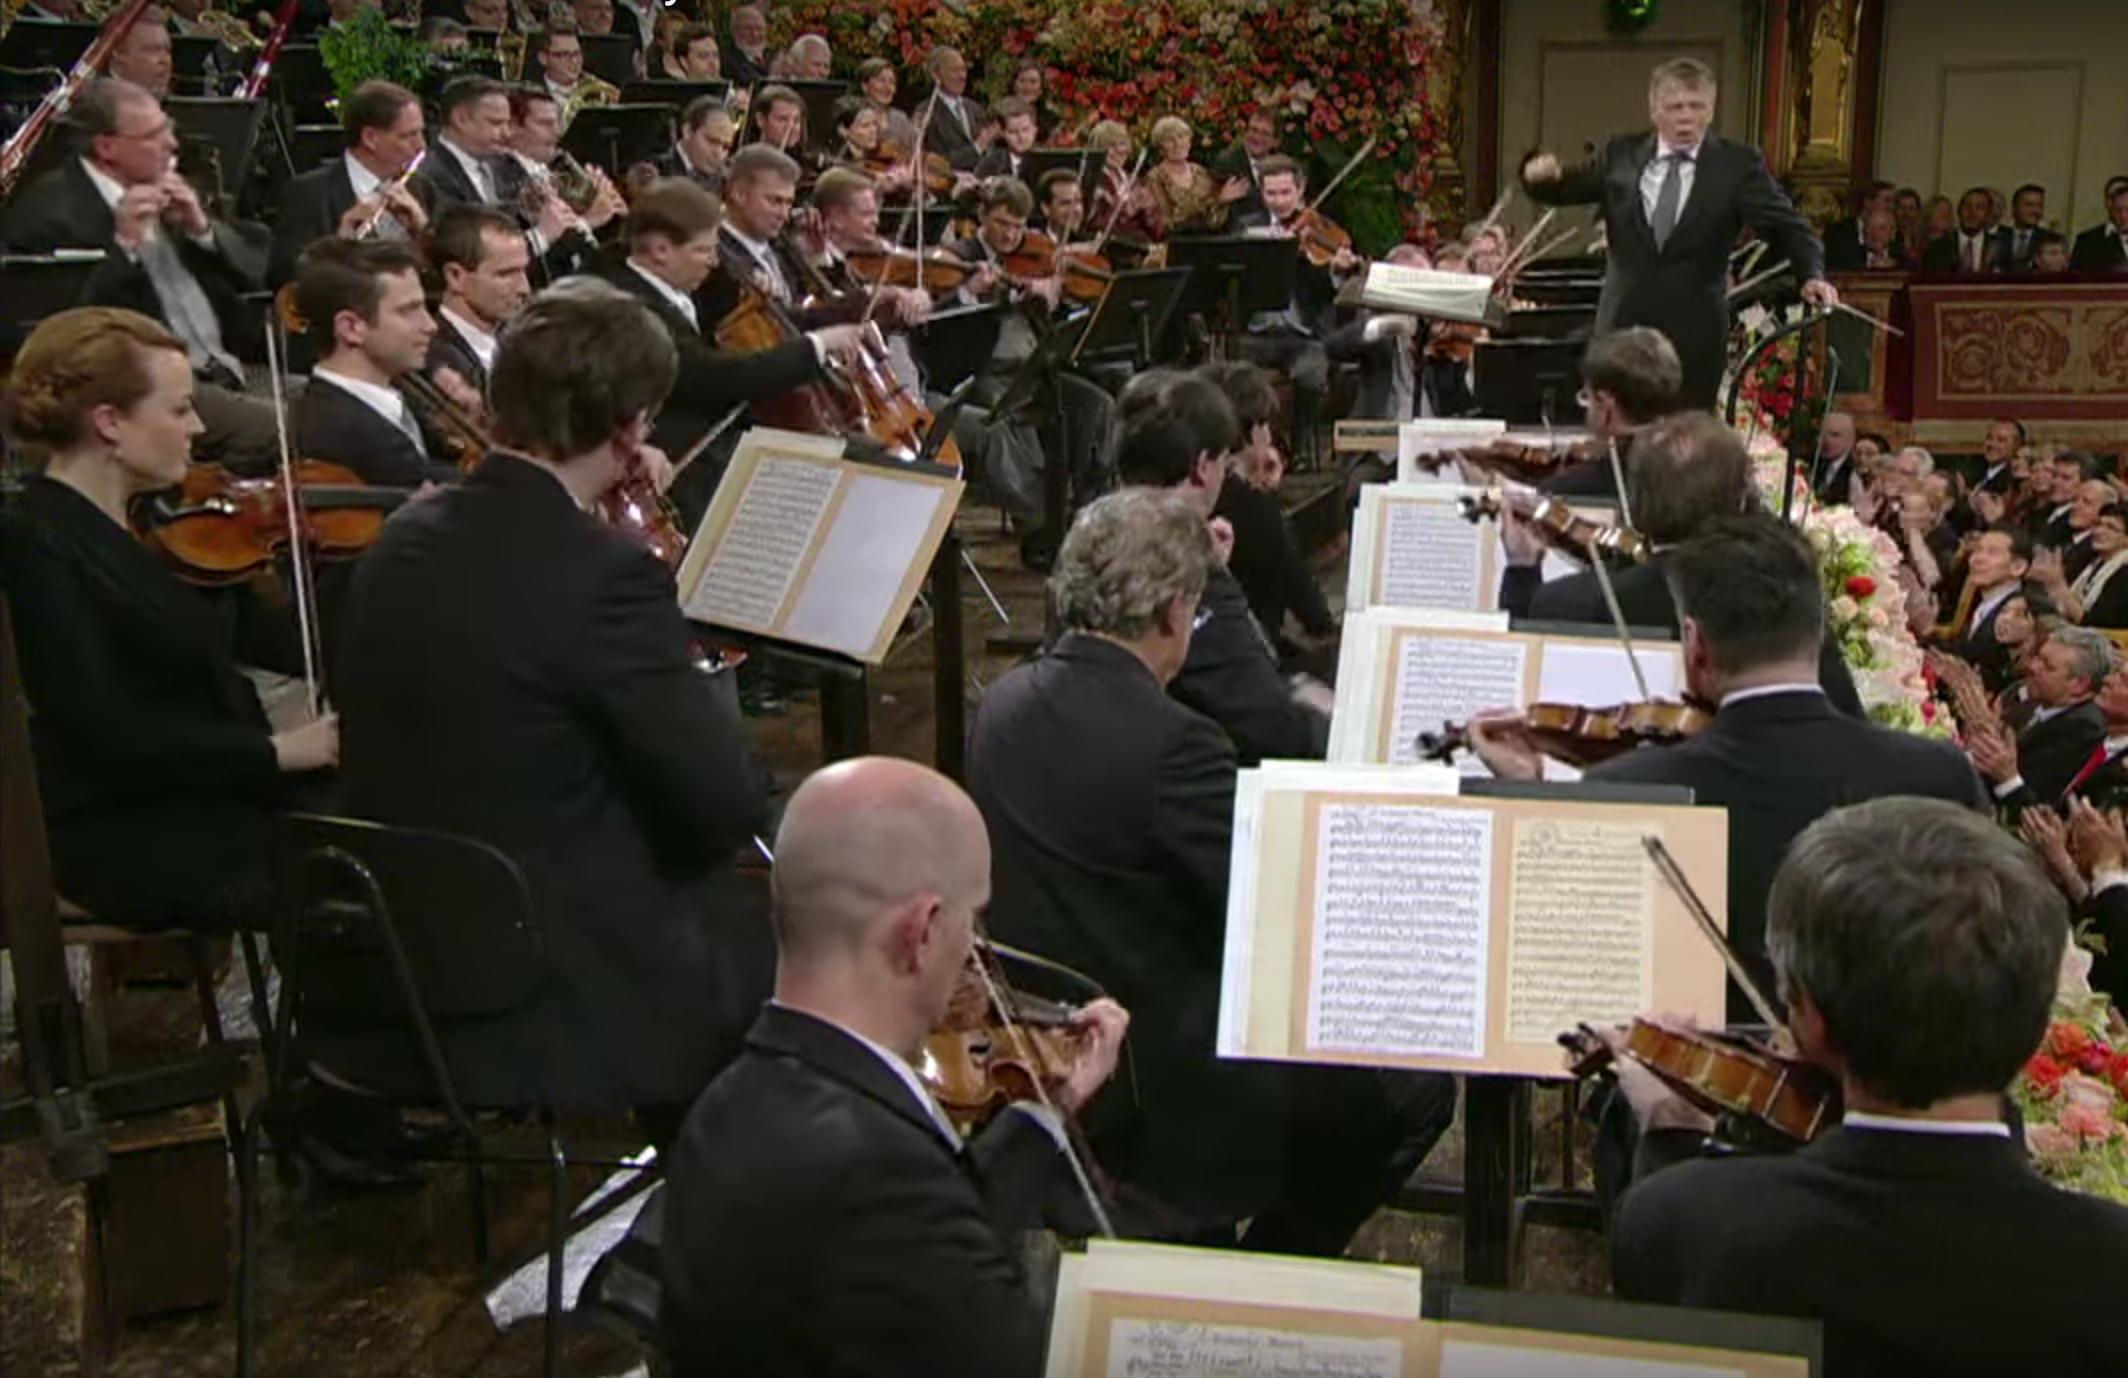 Vienna New Year's Eve Concert - Mariss Jansons